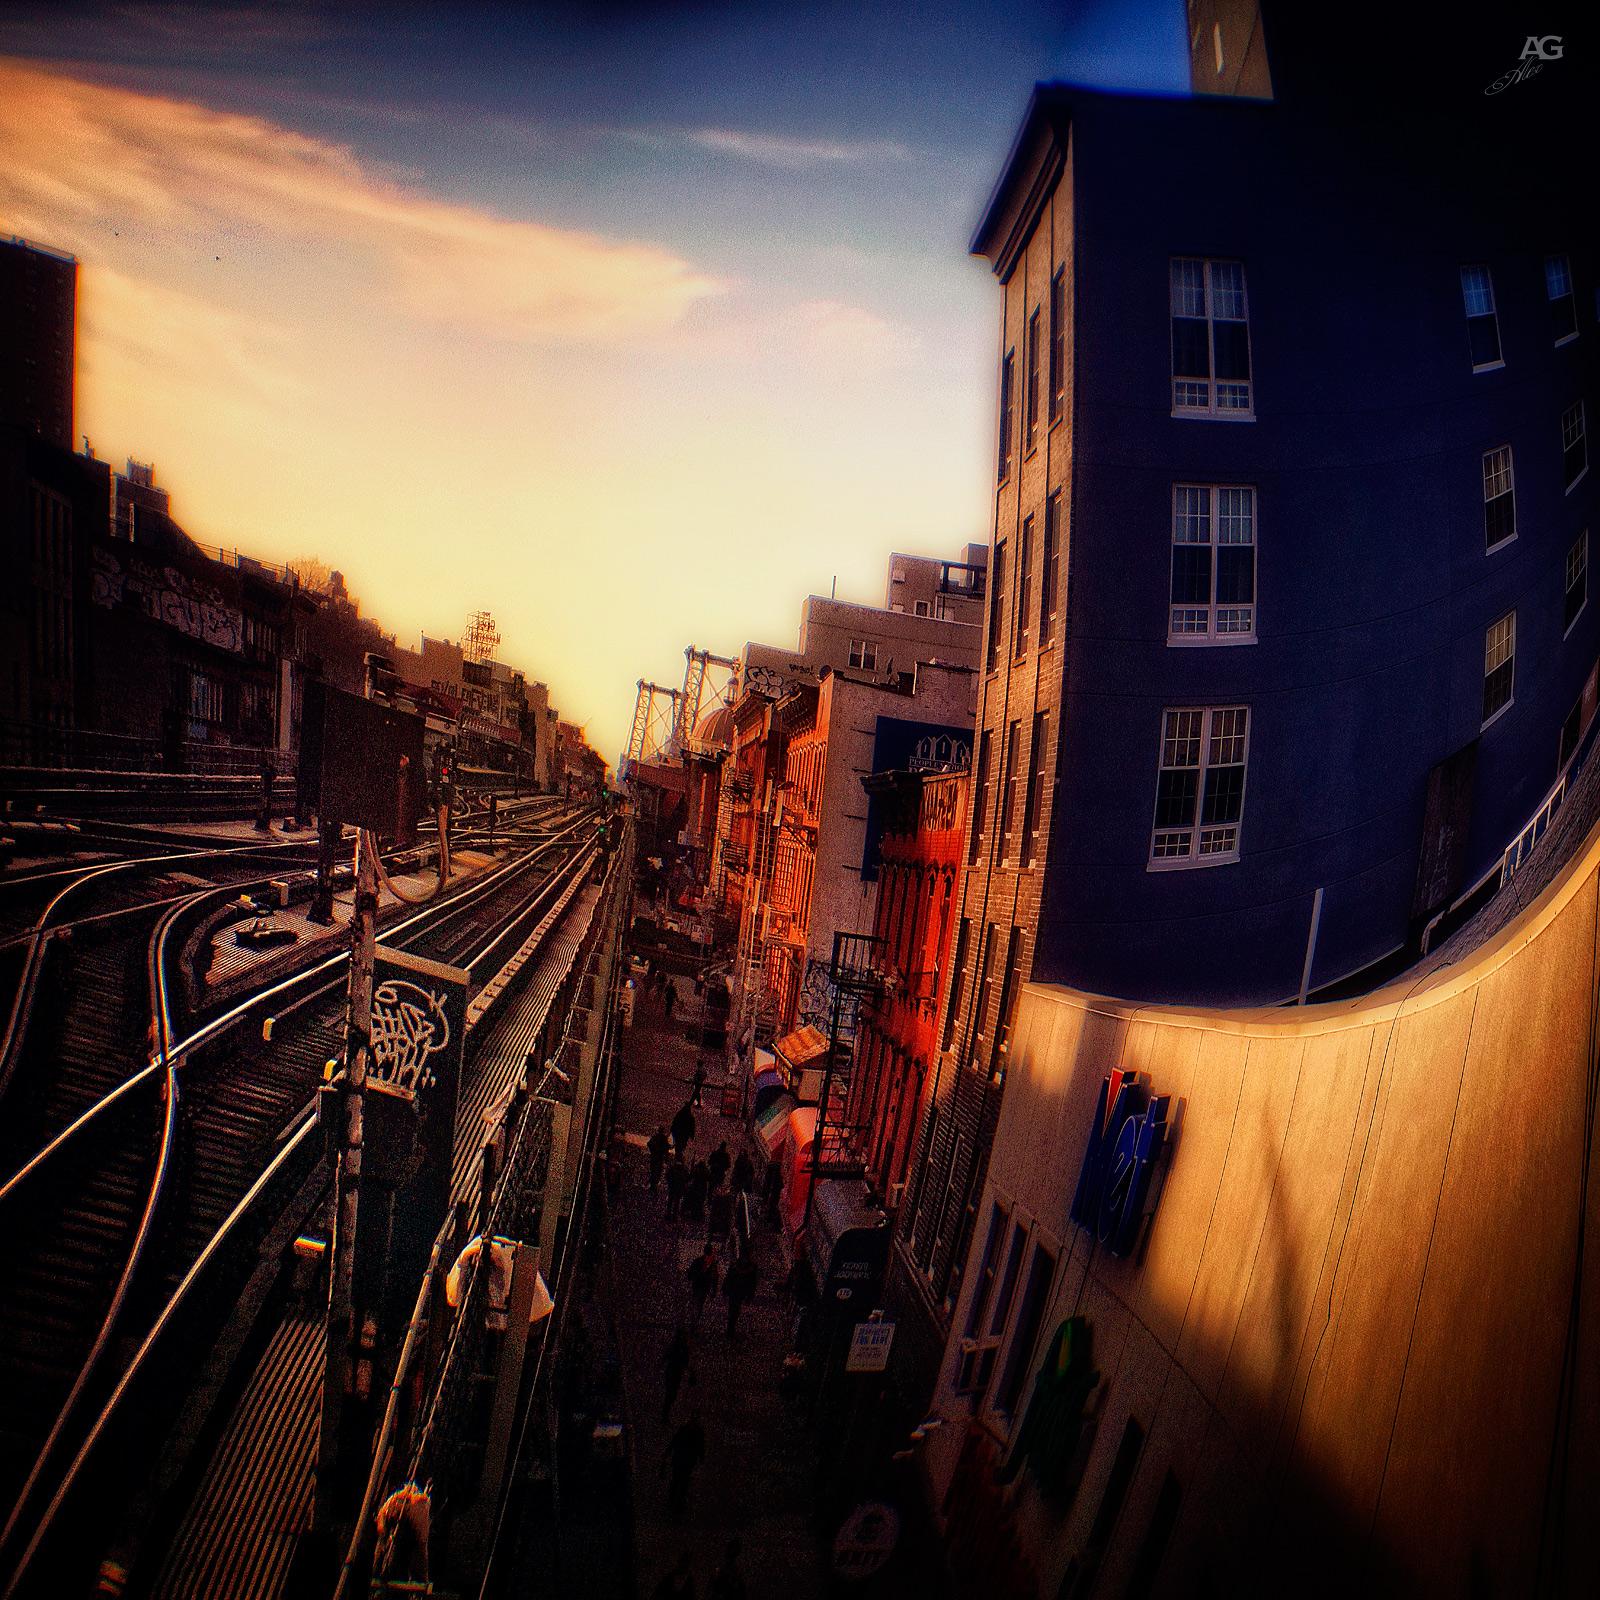 ViewOfTheElevatedTrainAndParallelStreetInWilliamsburg_ROmanika_warped_1600